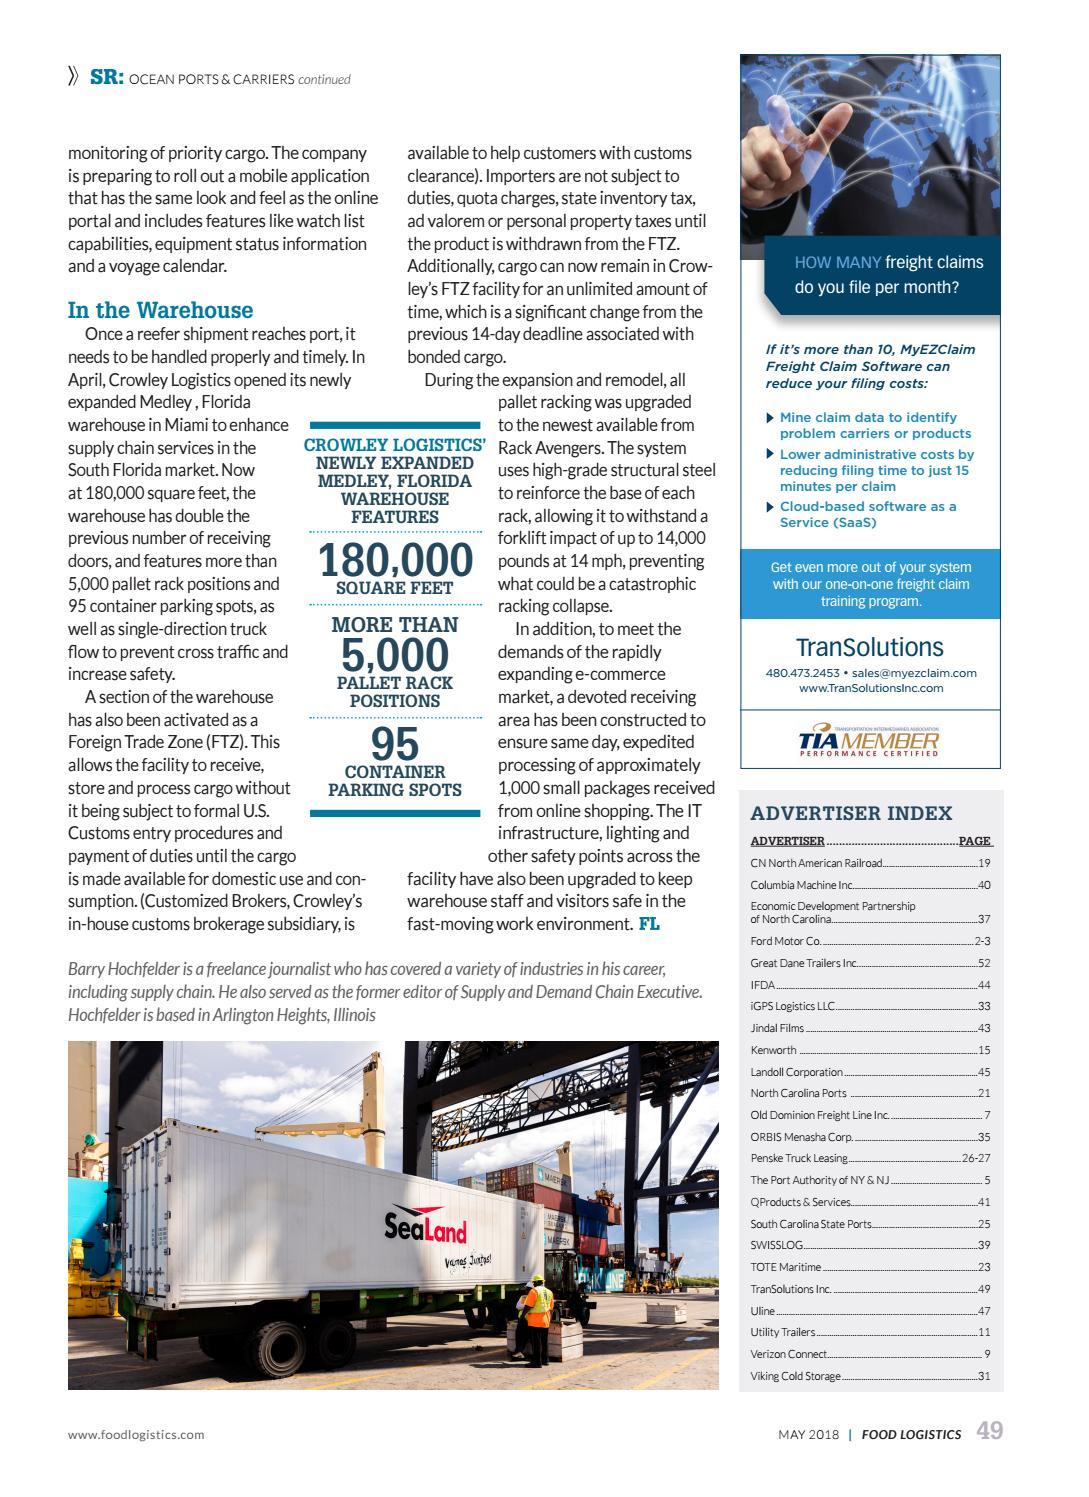 Food Logistics May 2018 by Supply+Demand Chain/Food Logistics - issuu